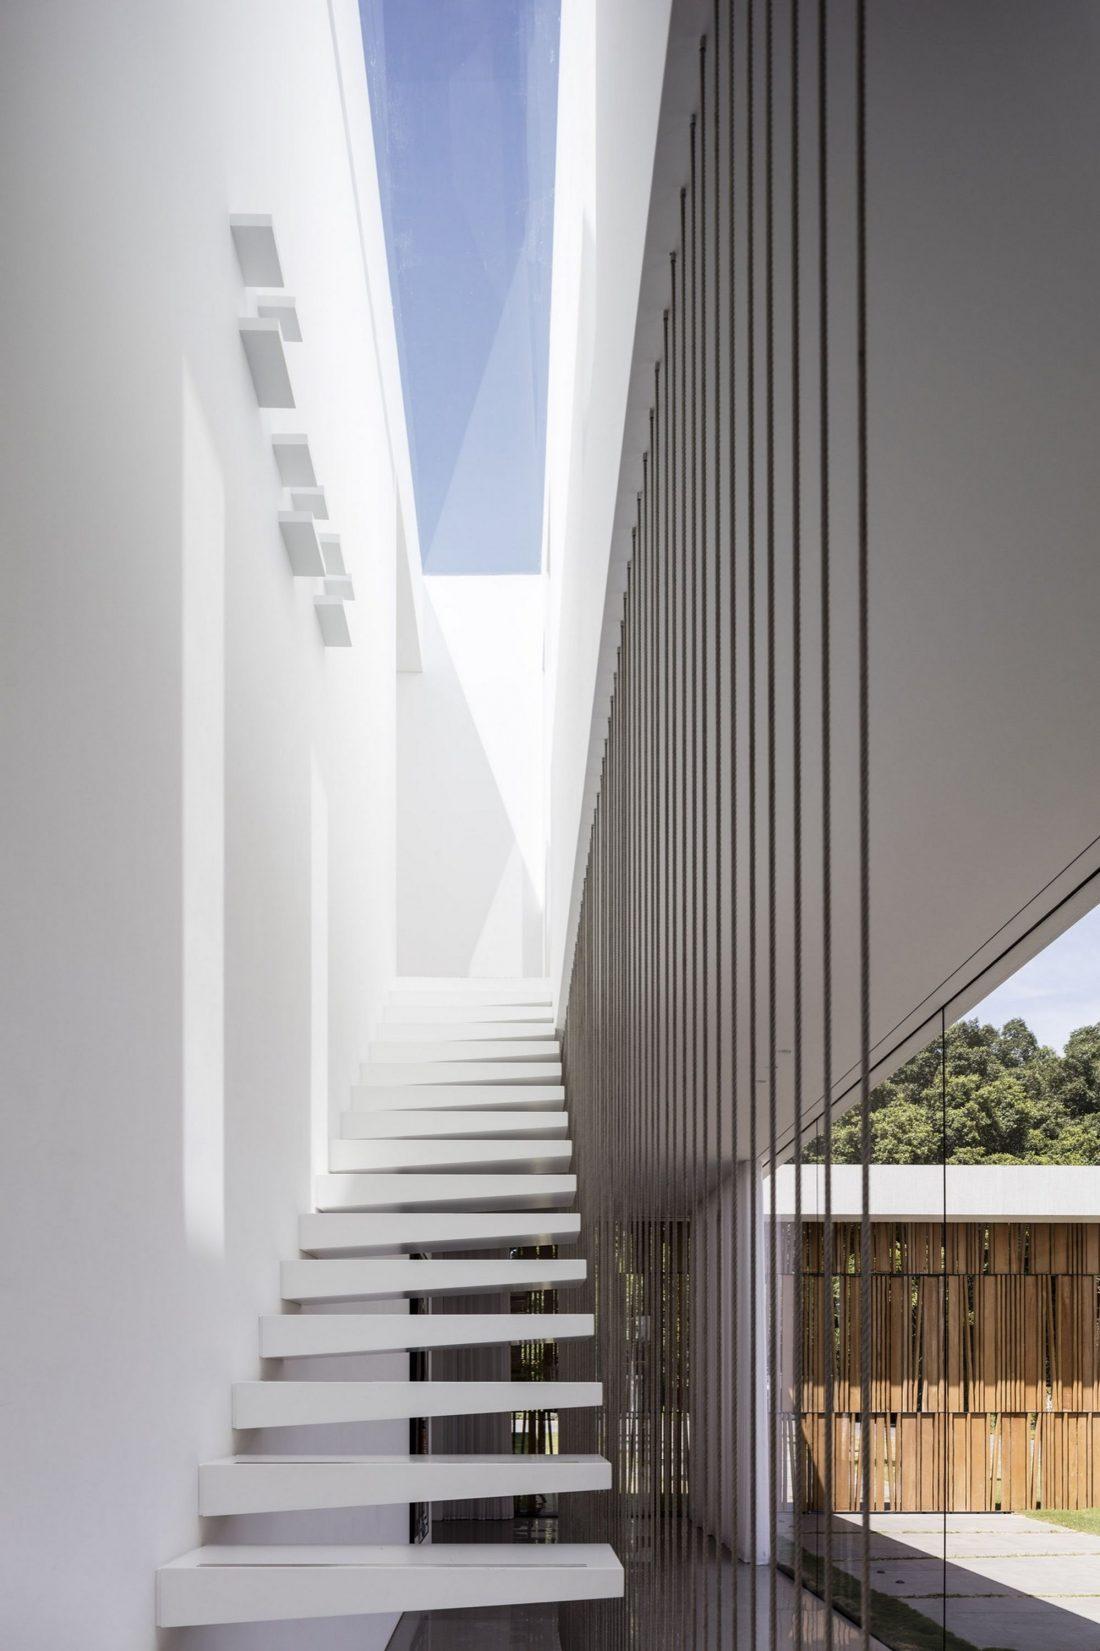 700-kvadratnyh-metrov-sveta-f-house-po-proektu-studii-pitsou-kedem-19